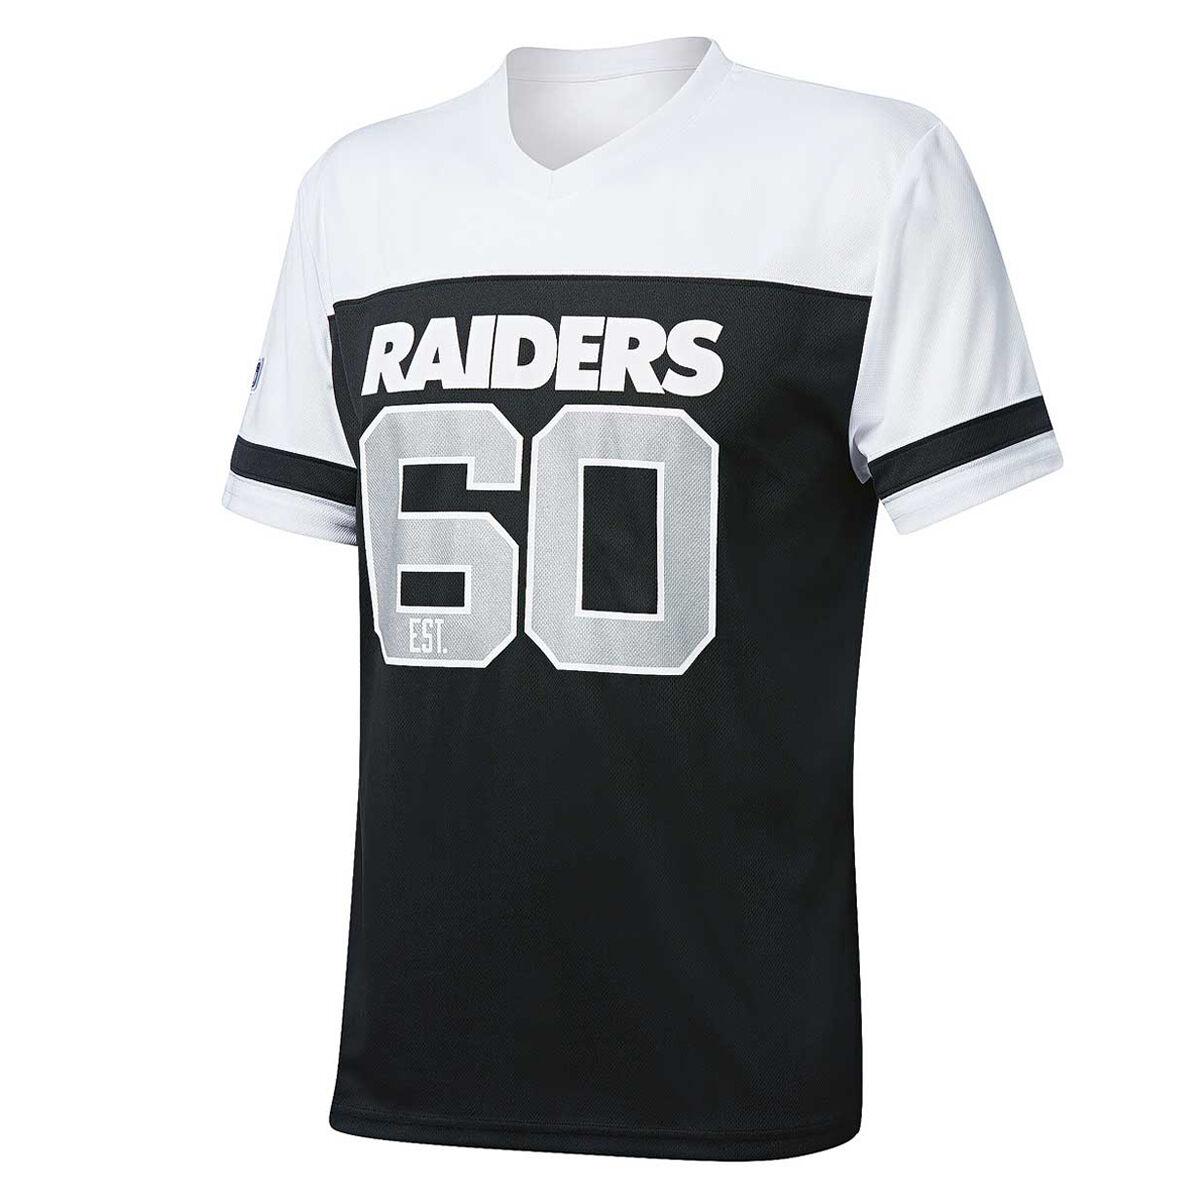 Oakland Raiders Merchandise rebel  supplier